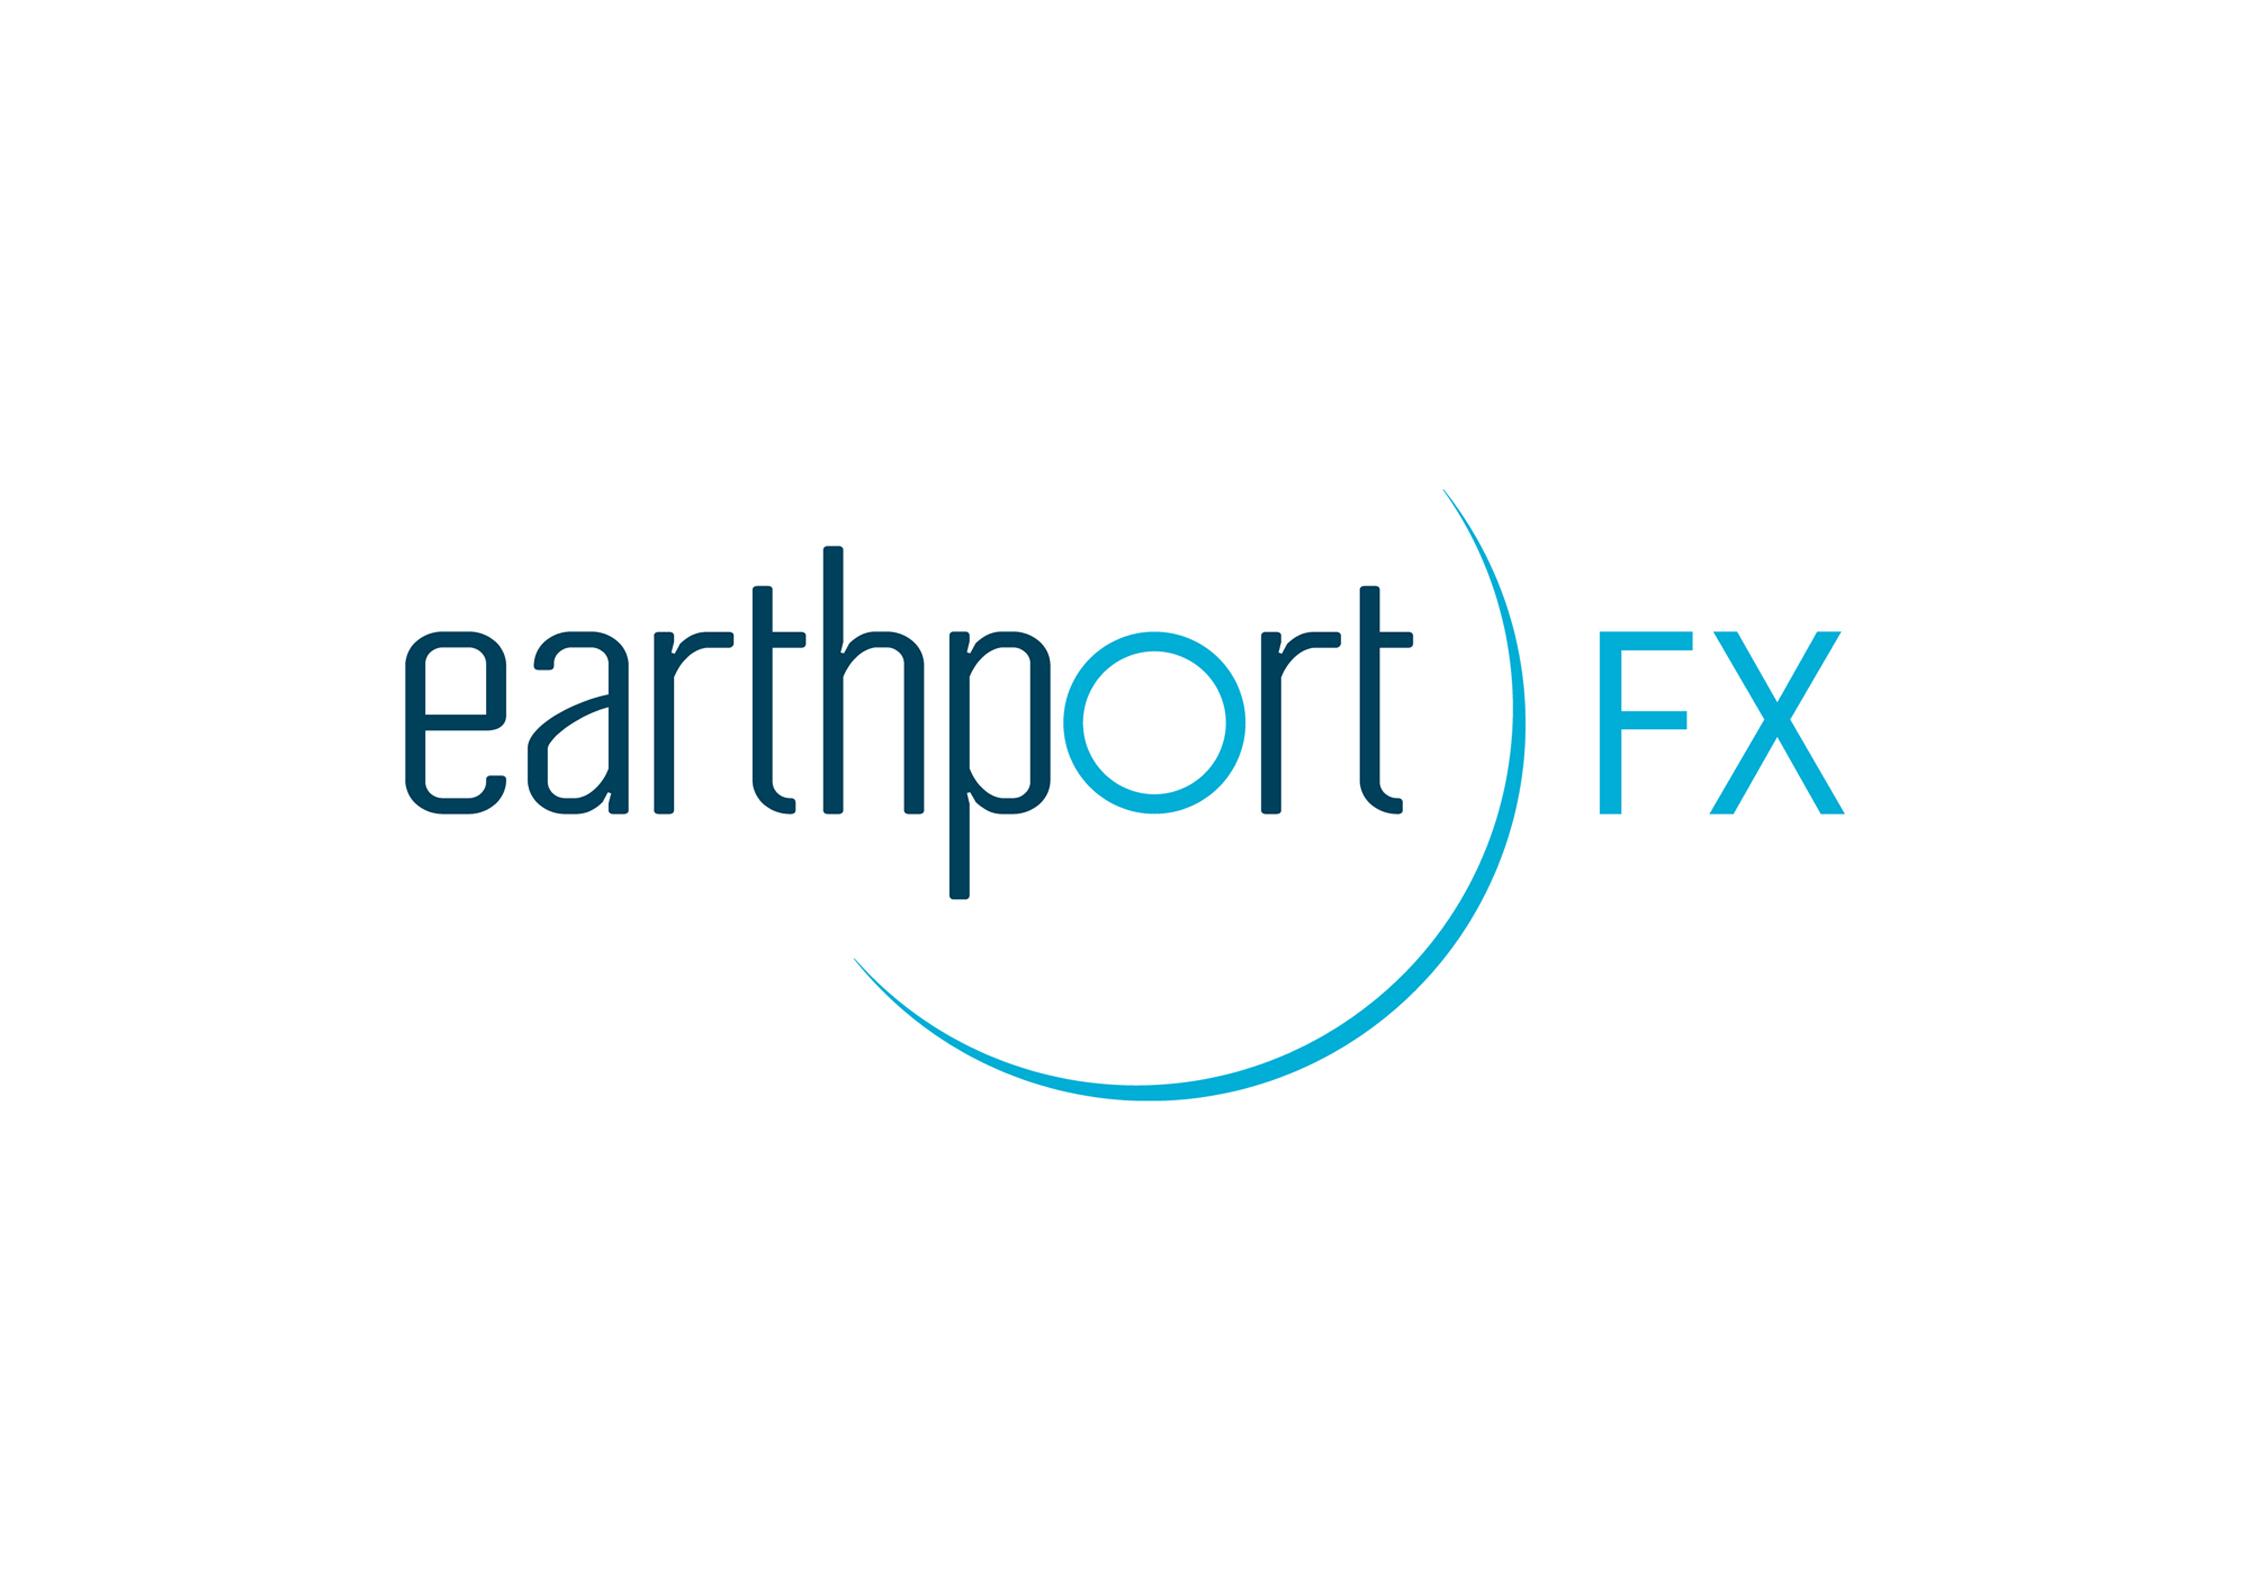 Baydonhill_Earthport_Logo.jpg